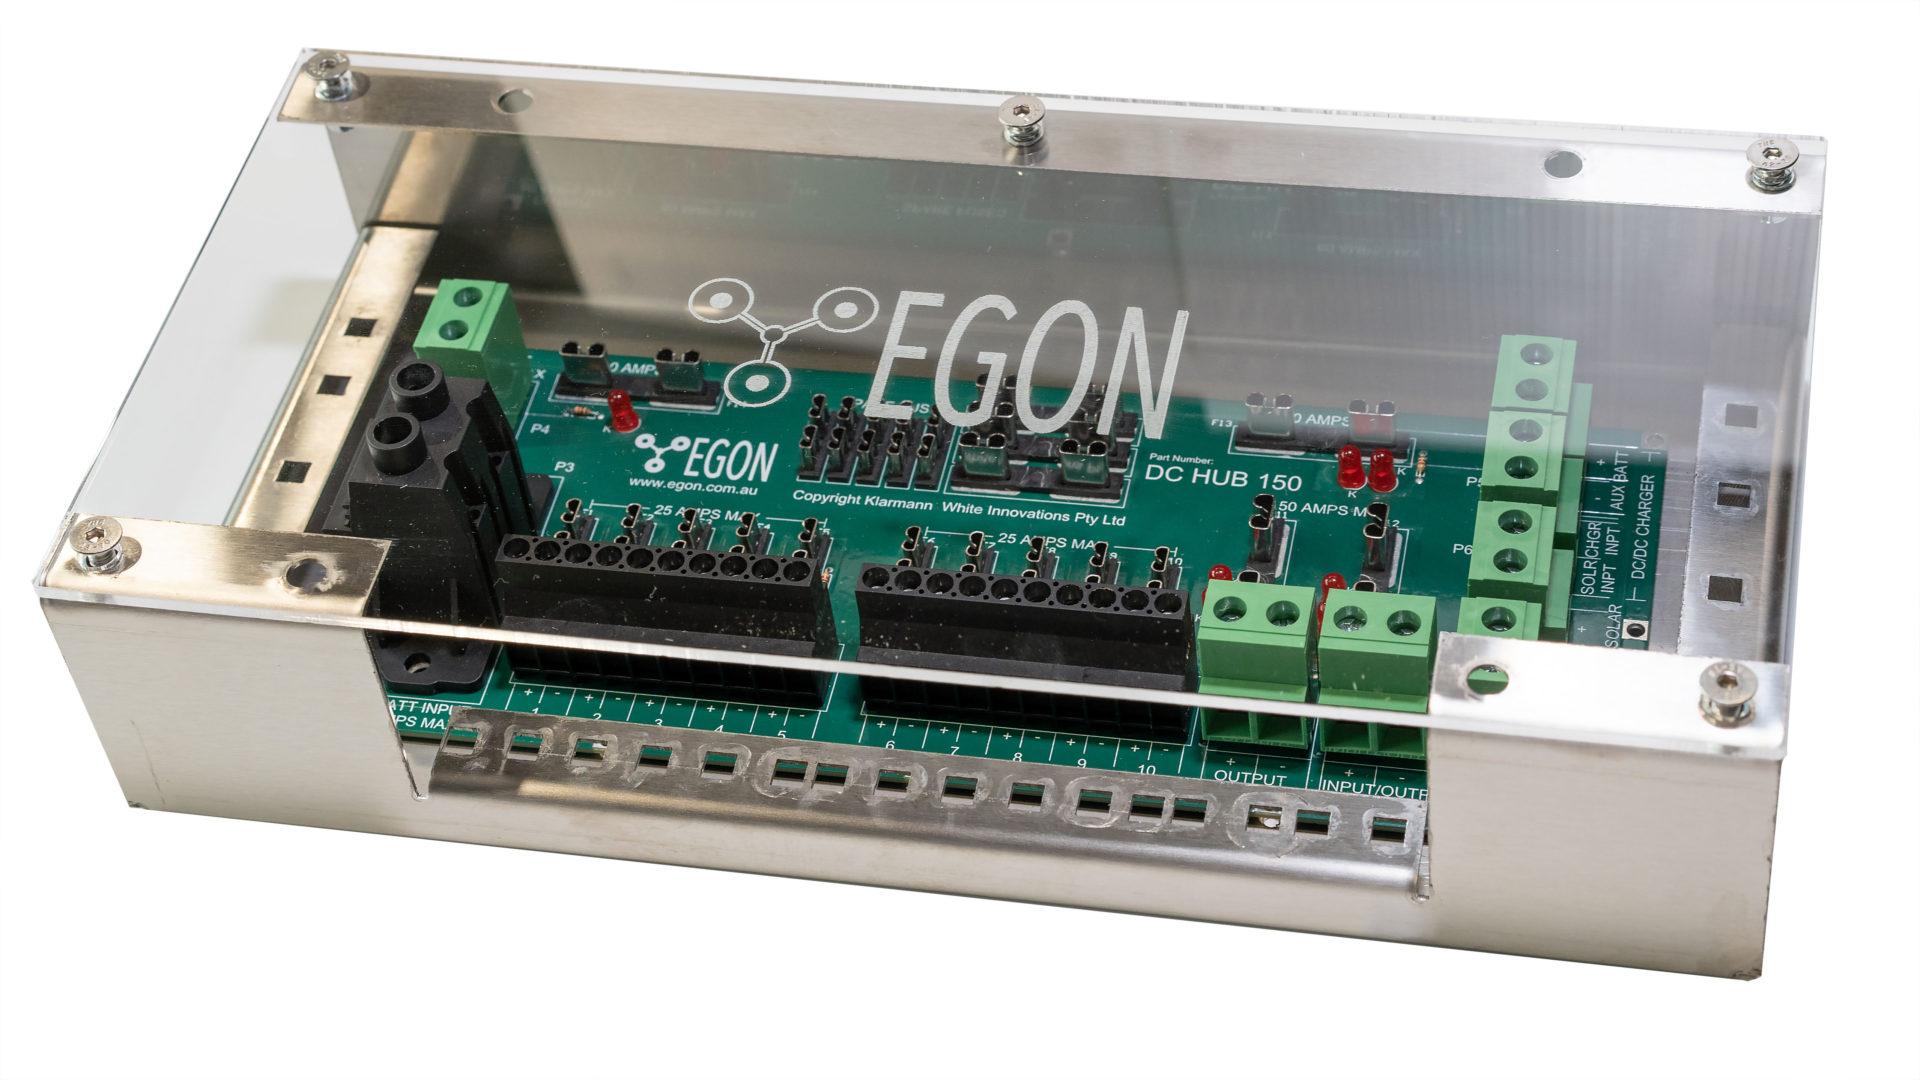 DC-Installations made easy. Unique, problem-solving solution. Egon DC-Hub